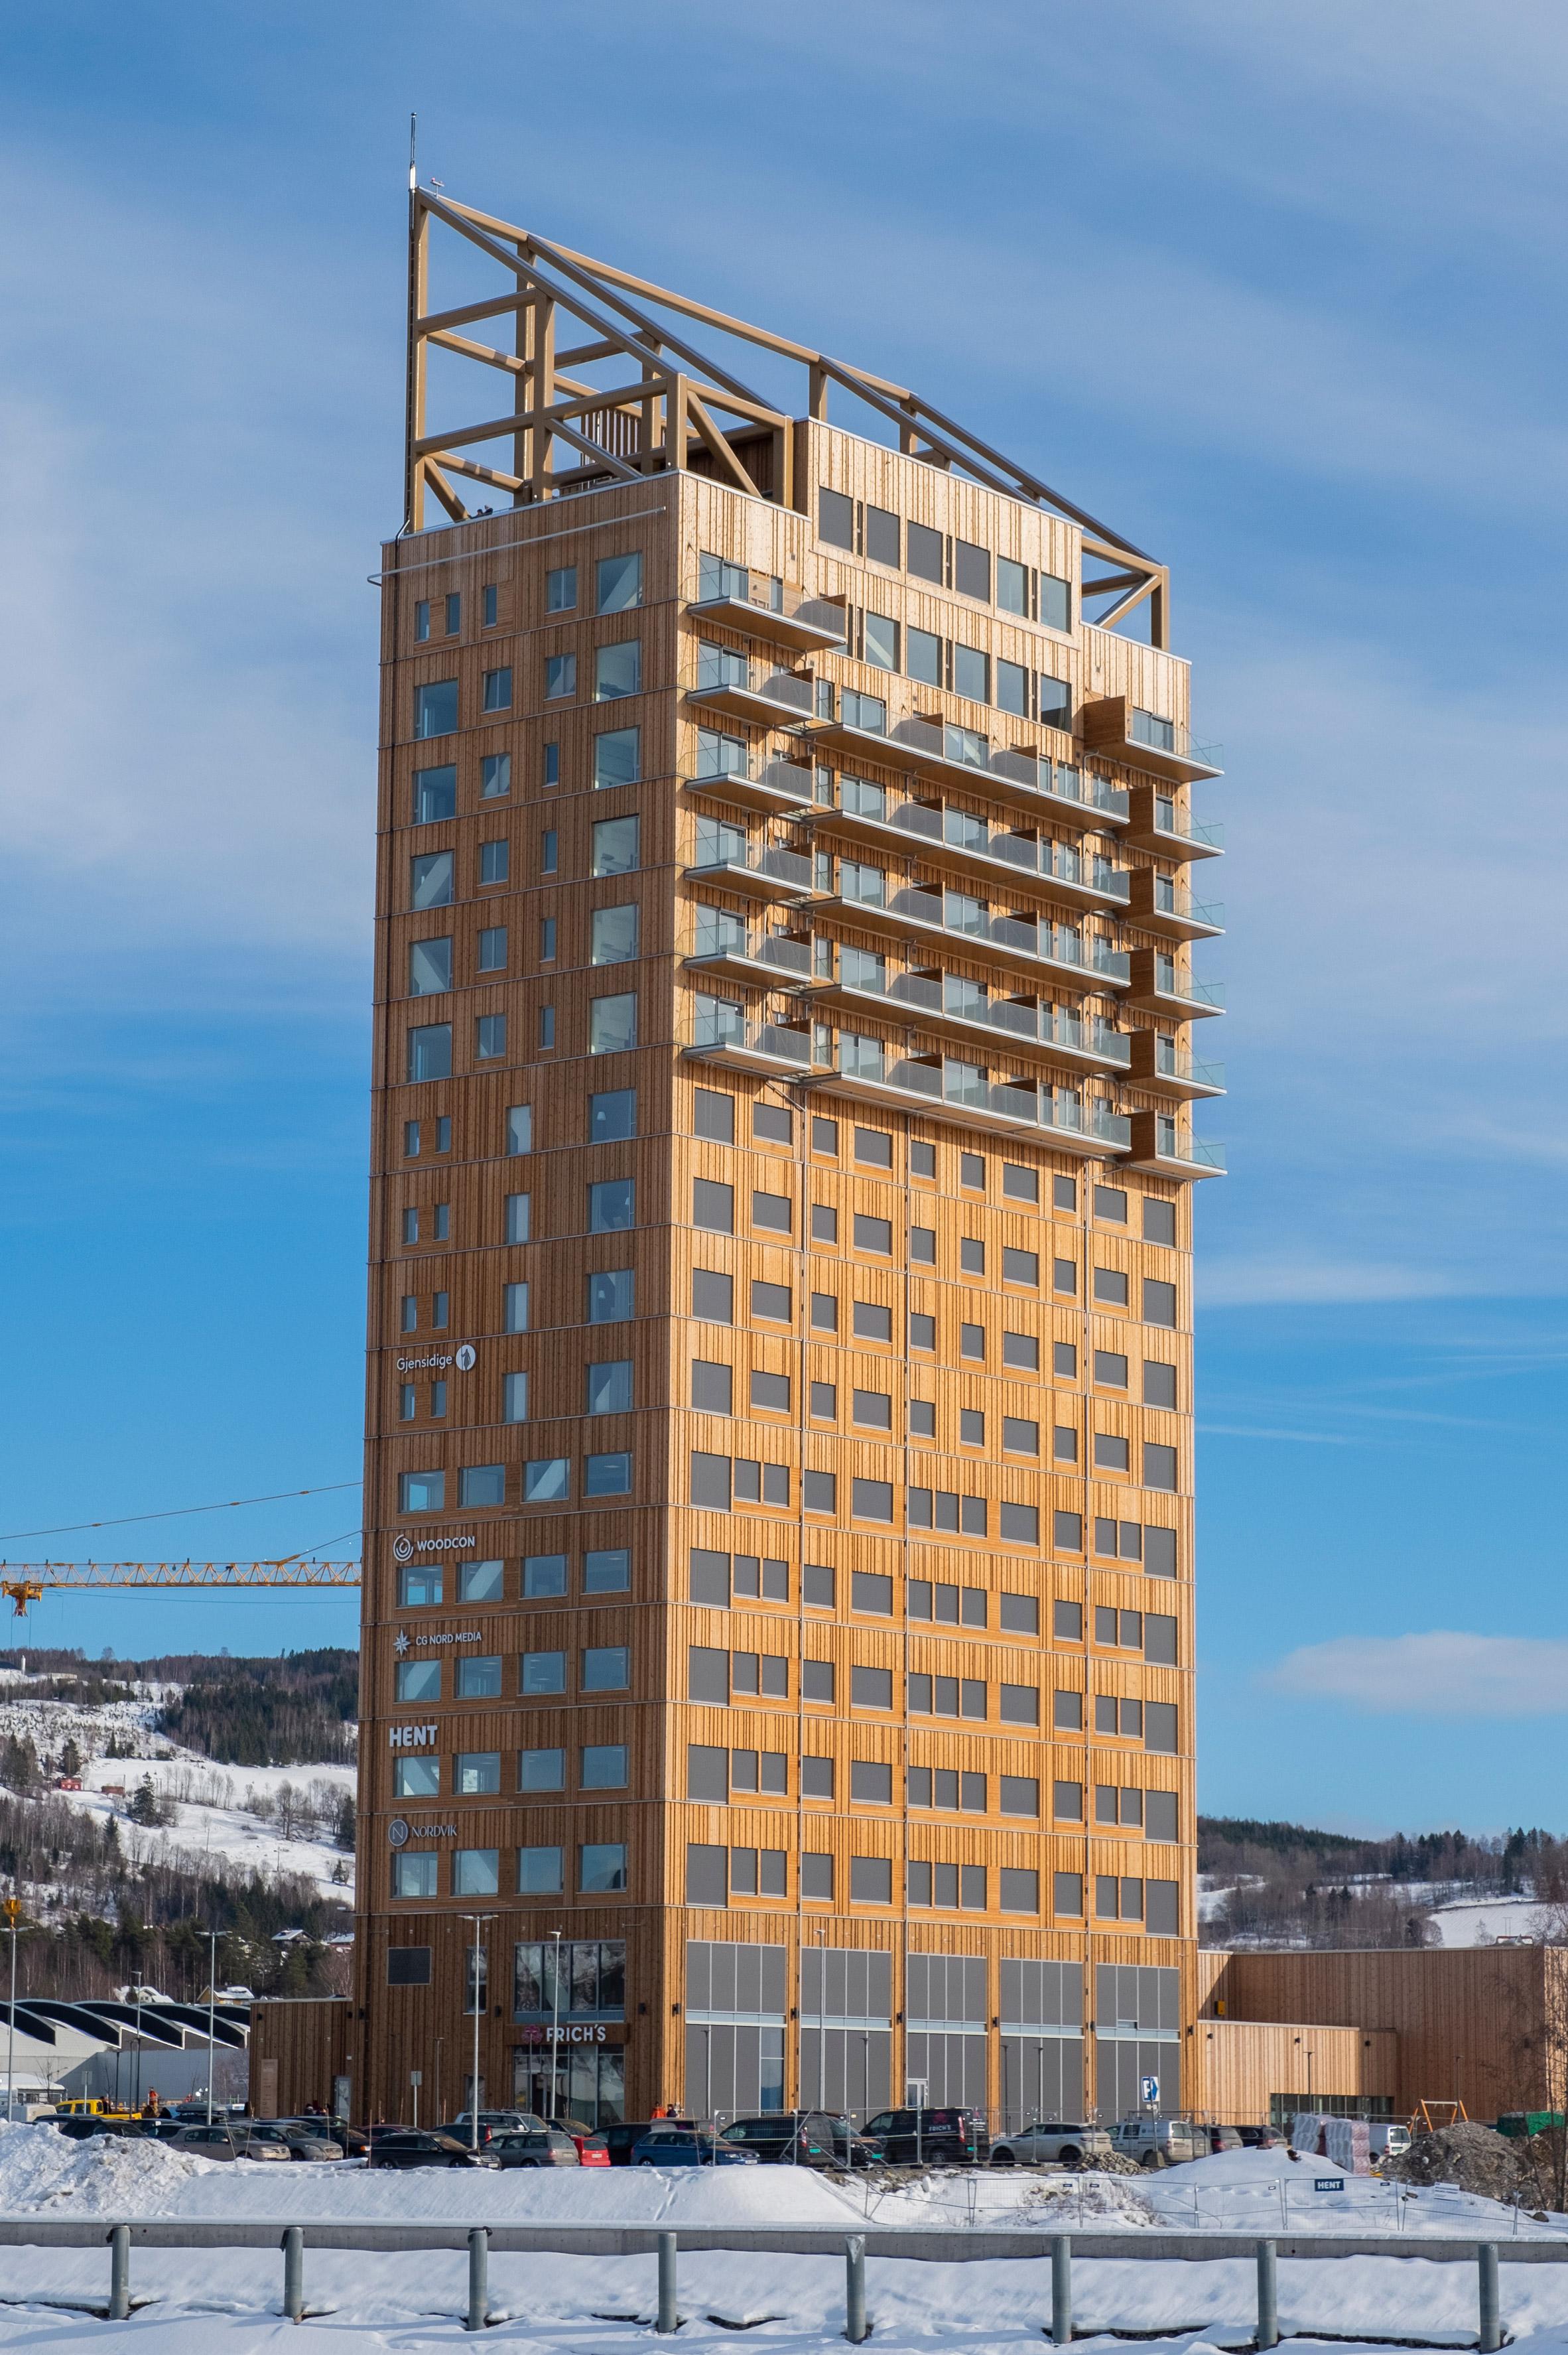 World's tallest timber building: Mjøstårnet by Voll Arkitekter in Brumunddal, Norway